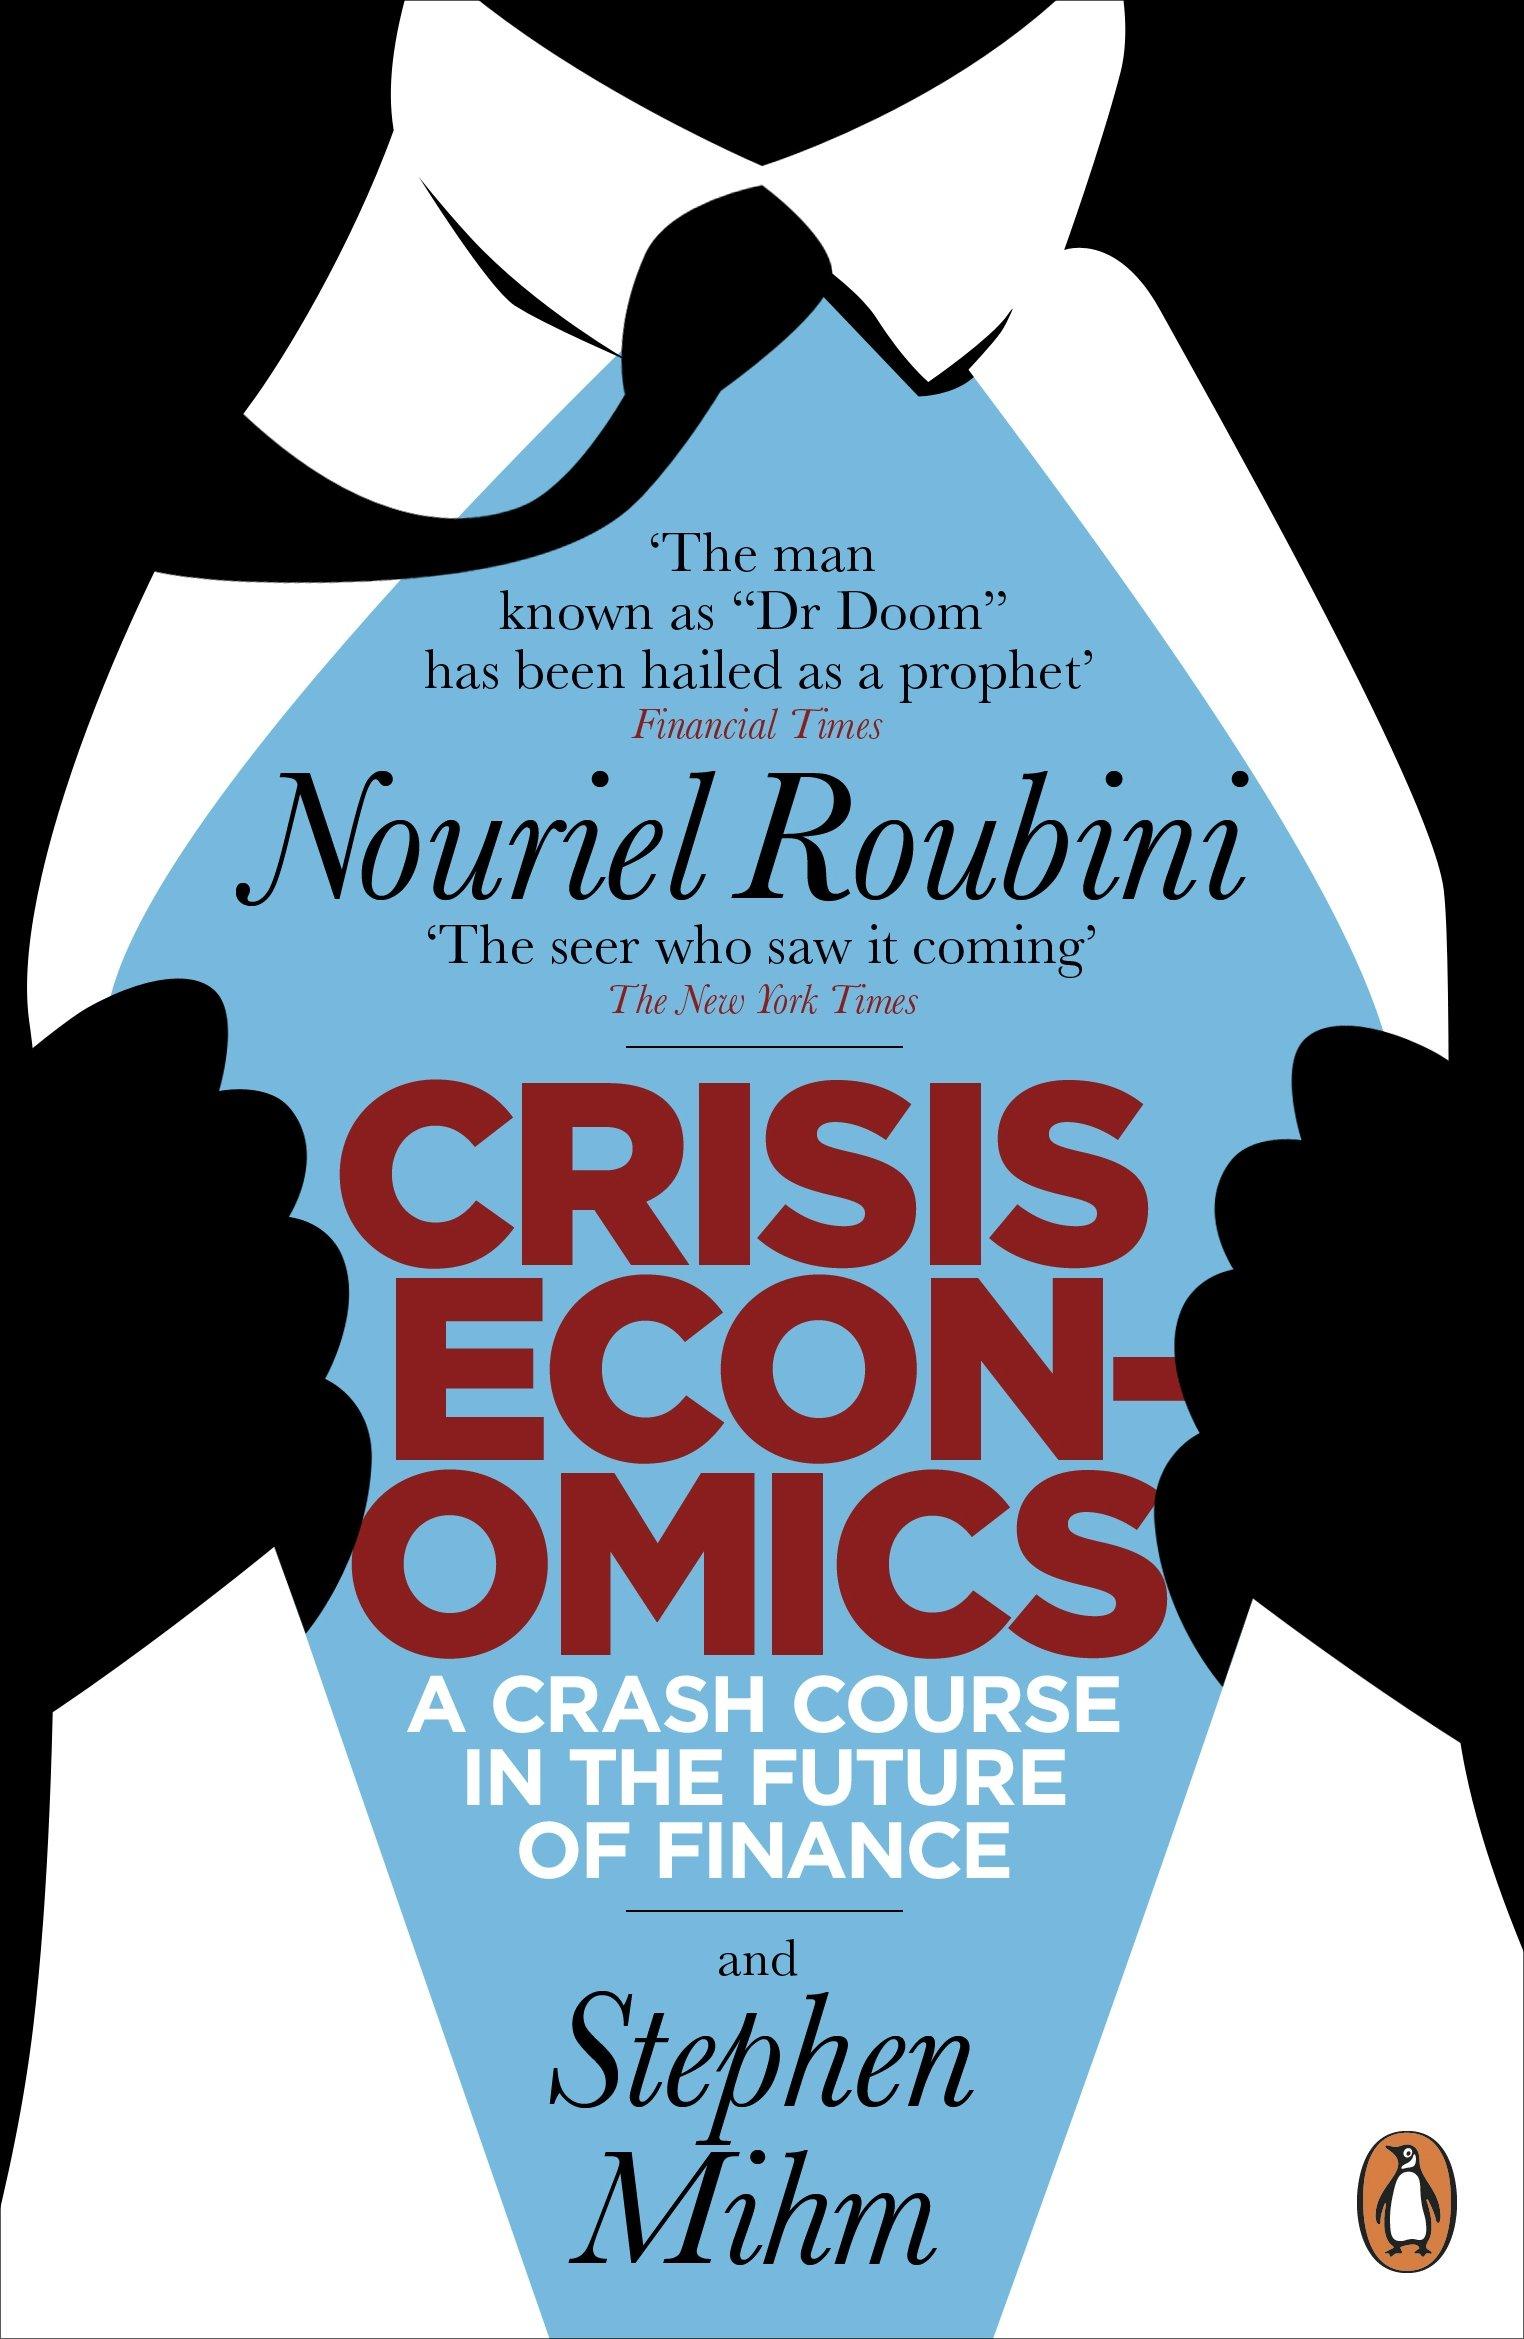 Crisis economics a crash course in the future of finance amazon co uk nouriel roubini stephen mihm 8580001453248 books